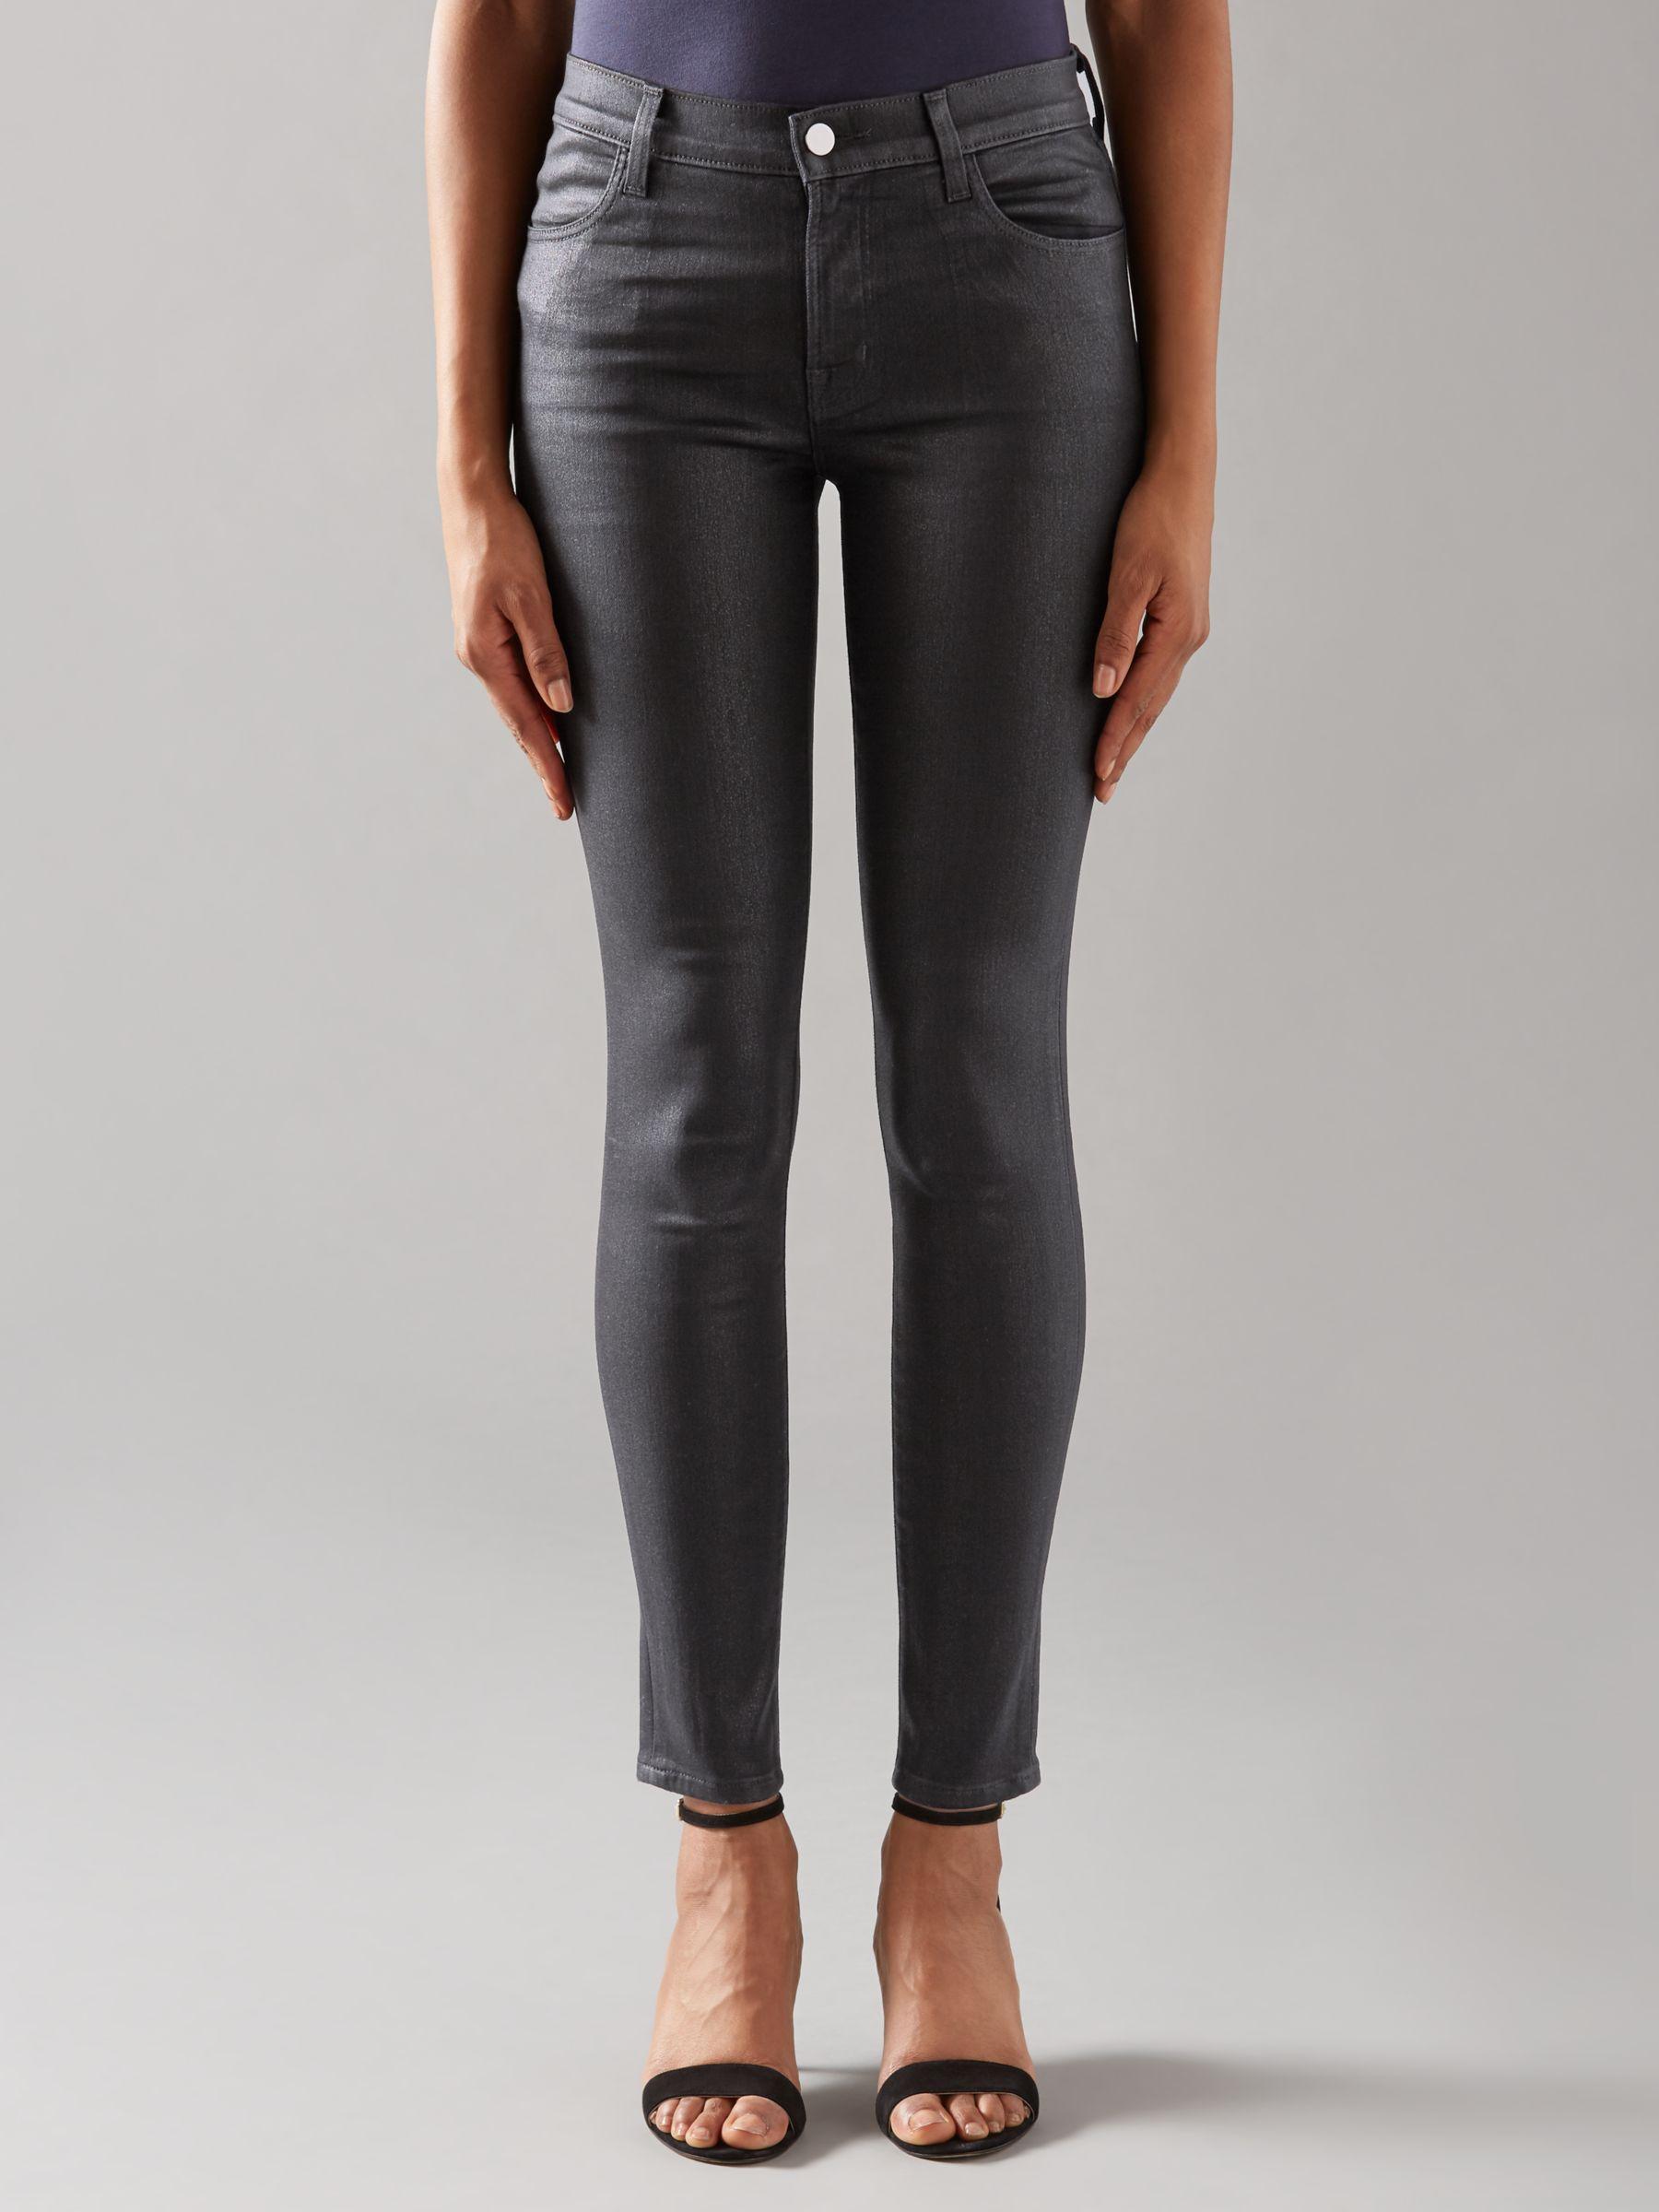 J Brand J Brand 620 Mid Rise Super Skinny Jeans, Fearless